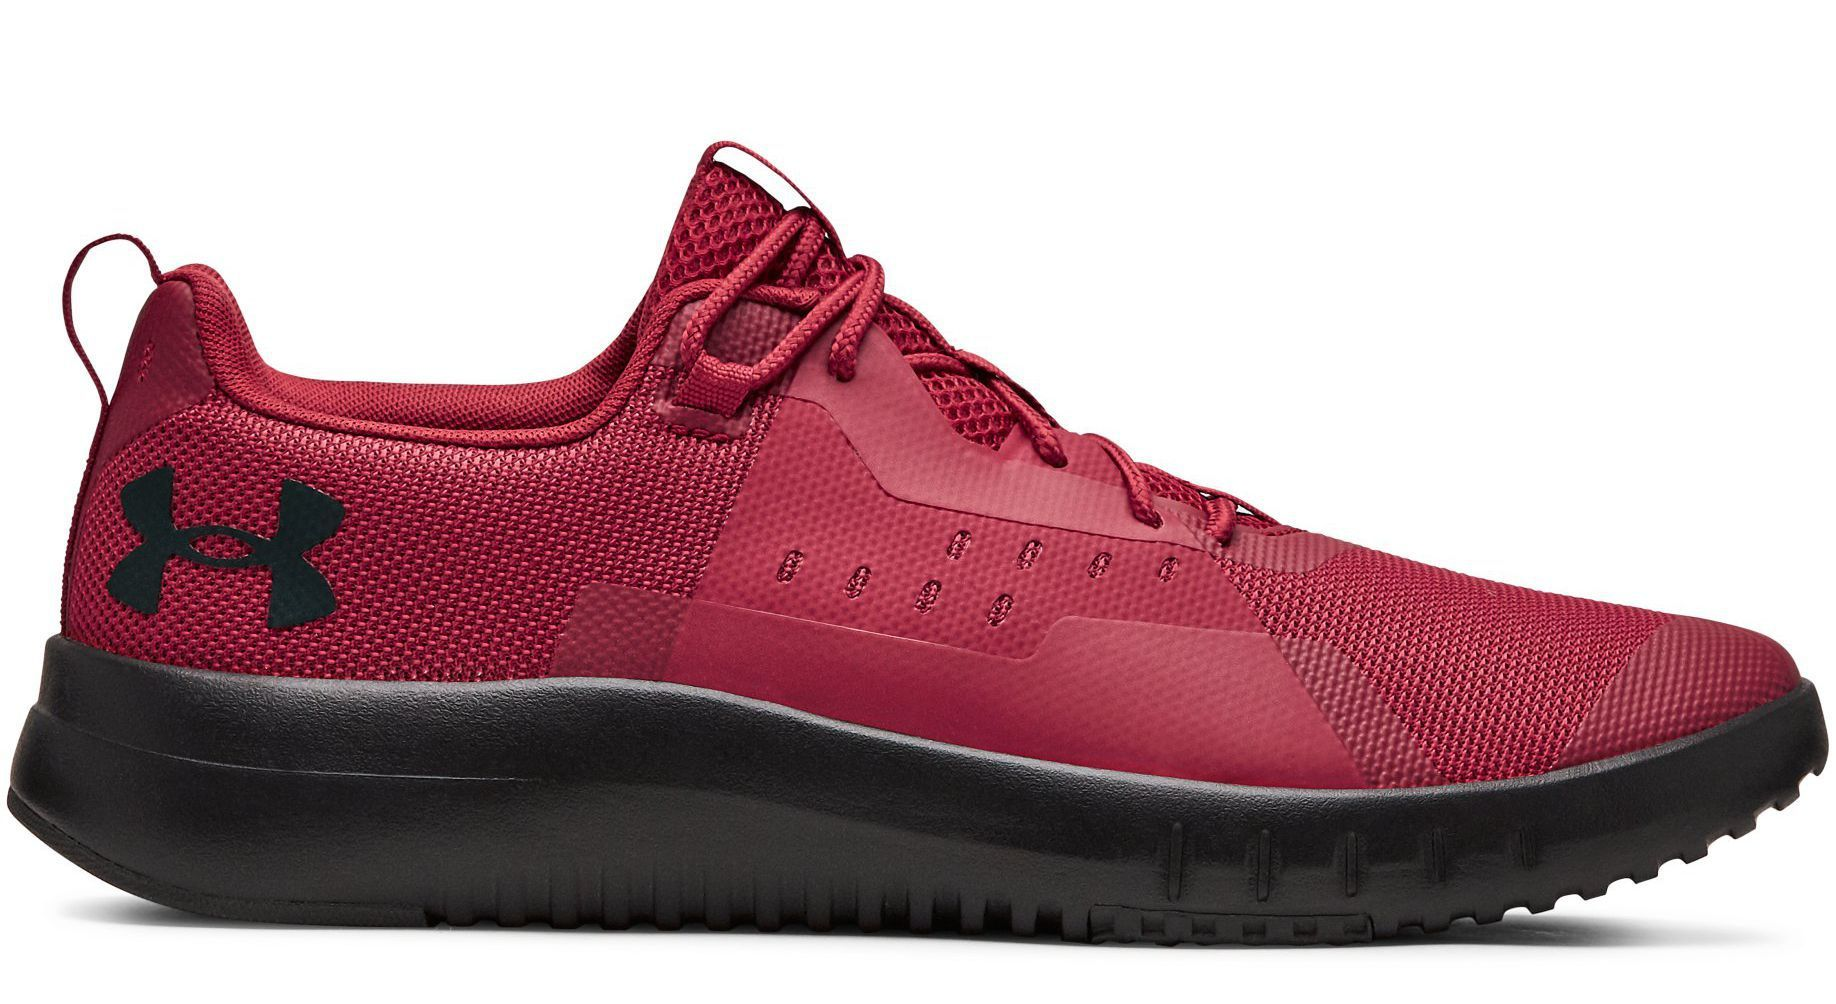 Weightlifting & Training Shoes (Nike, Adidas, Reebok) Free